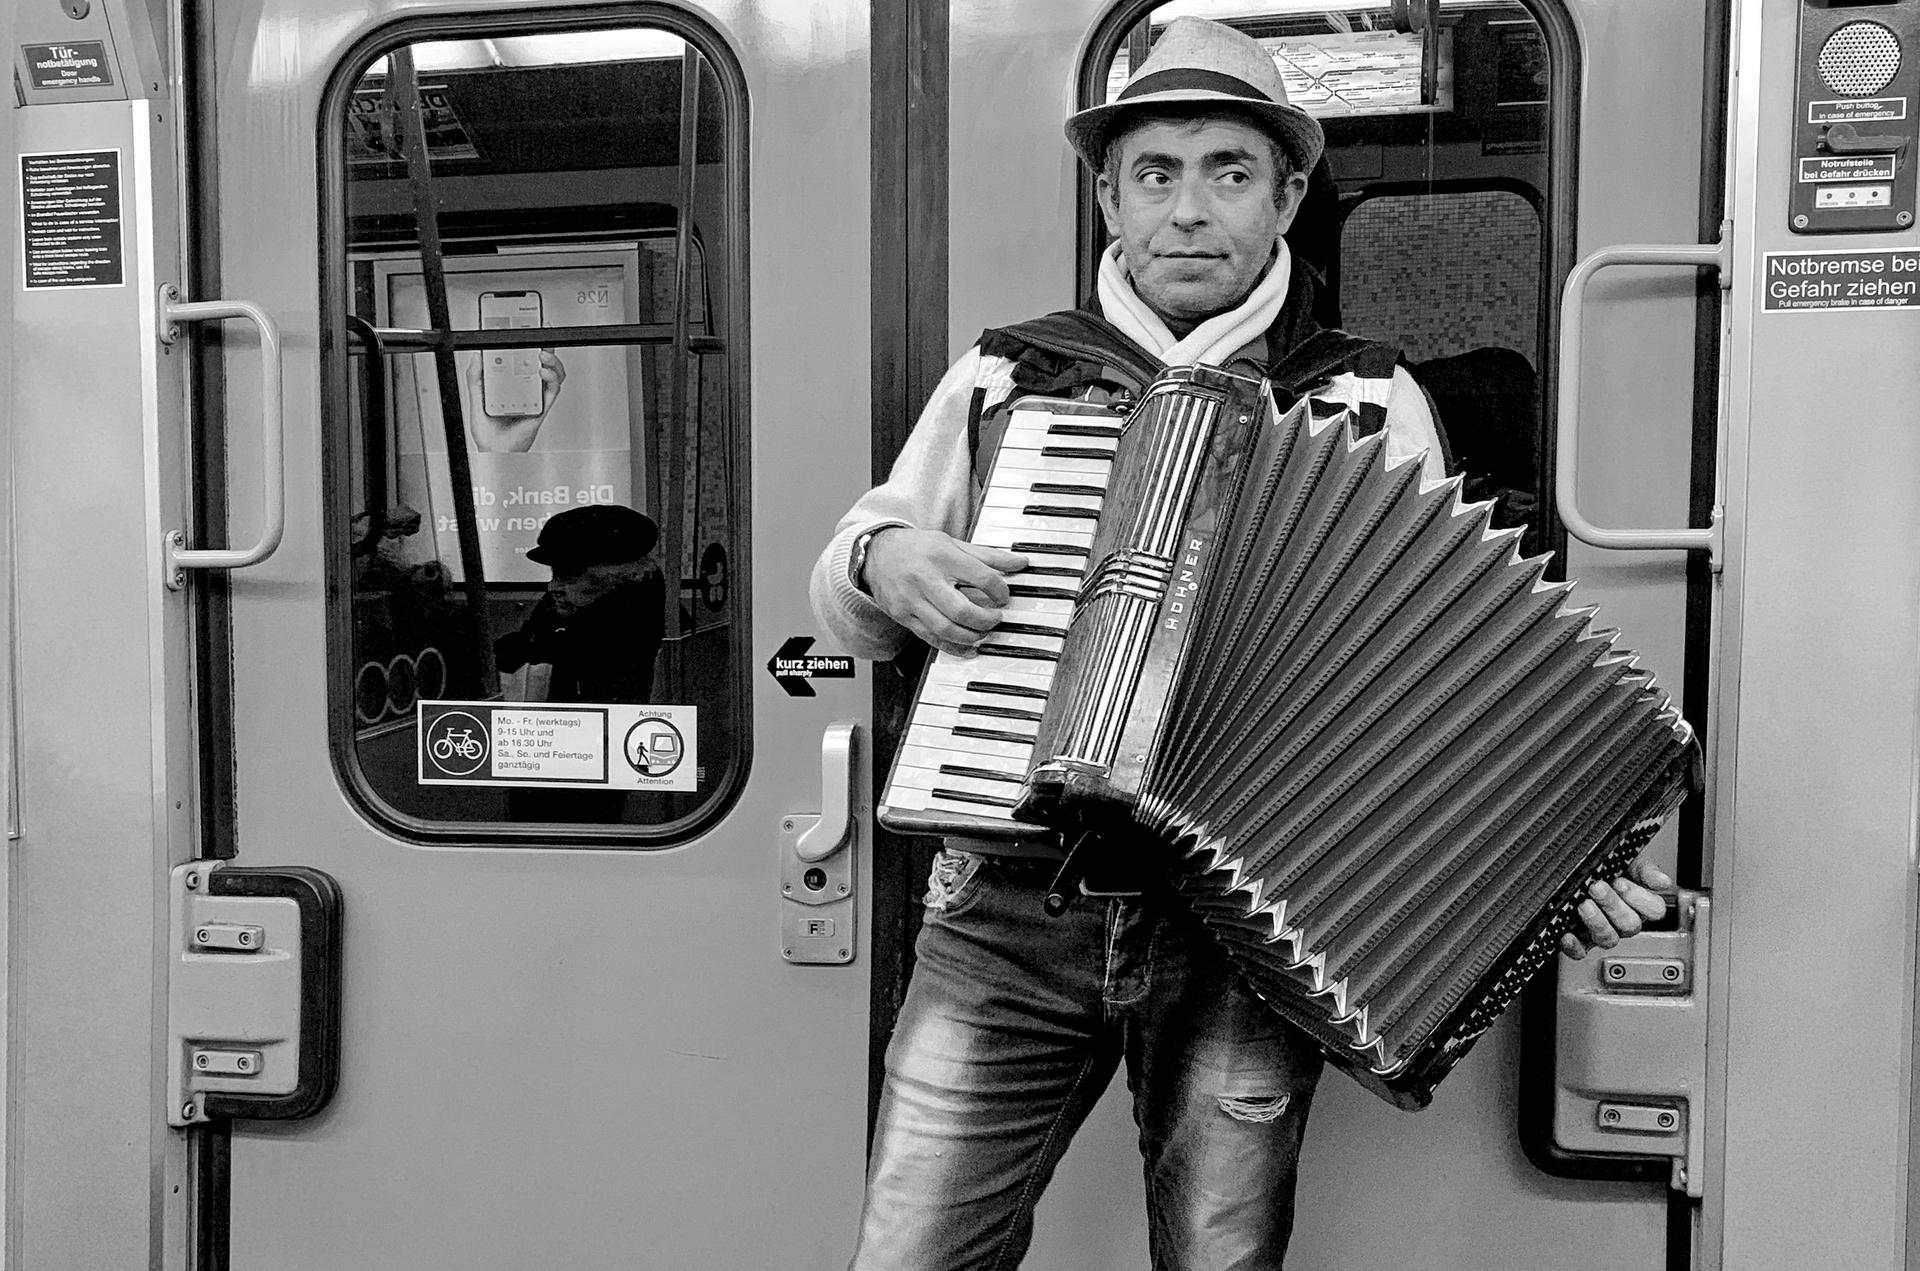 Музика в метрото от Marina Nizamska - marinizam